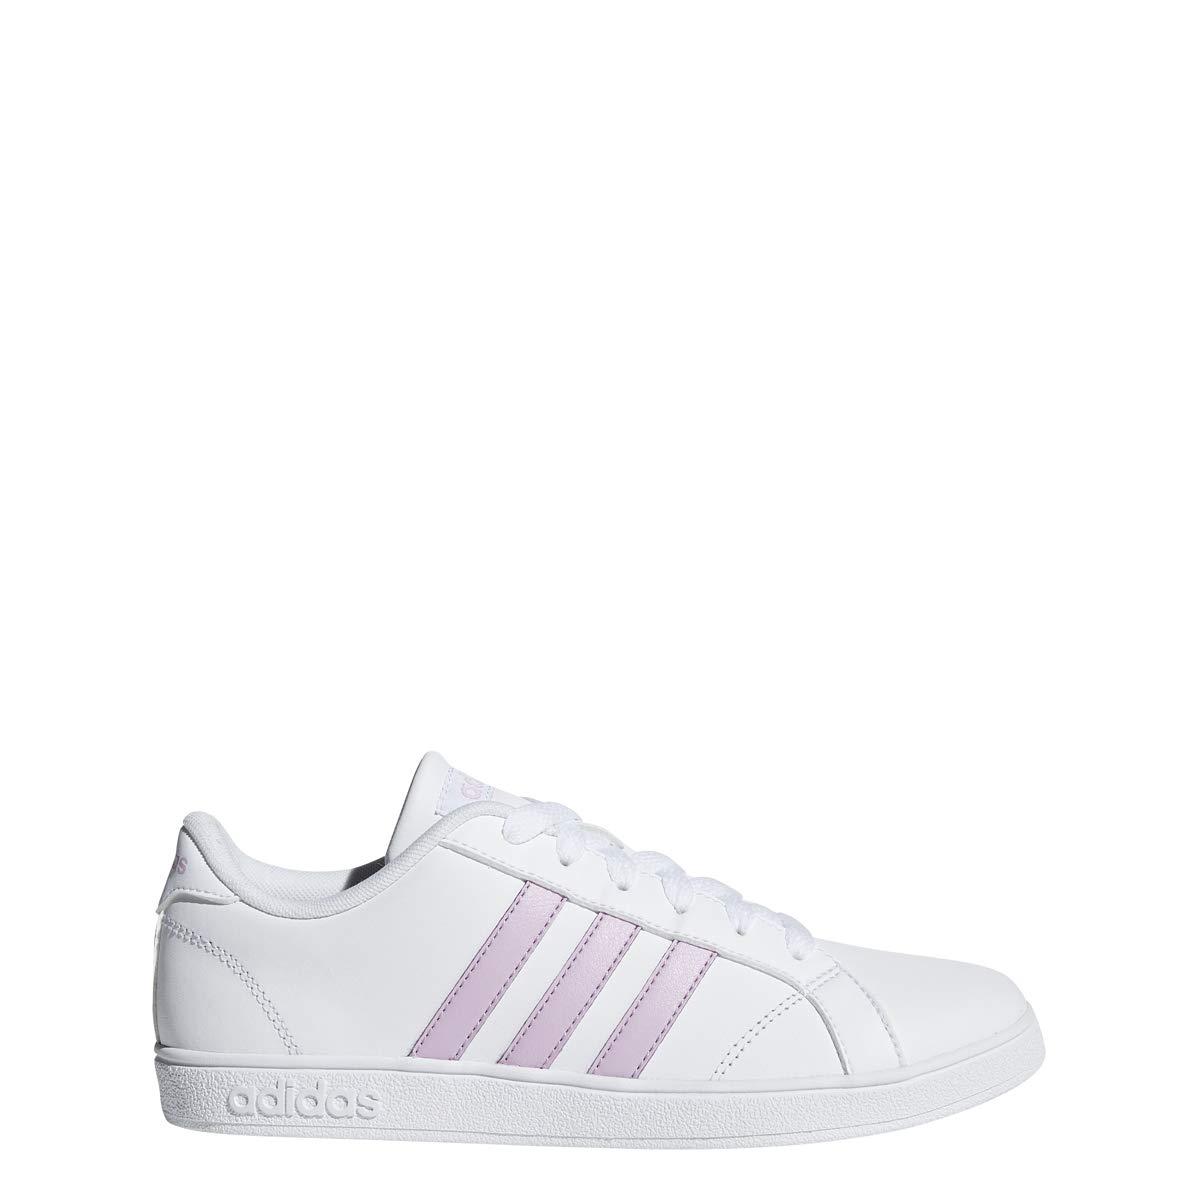 on sale 7ca31 1e5e8 Galleon - Adidas Performance Unisex-Kids Baseline, White Clear Lilac White,  2 M US Little Kid